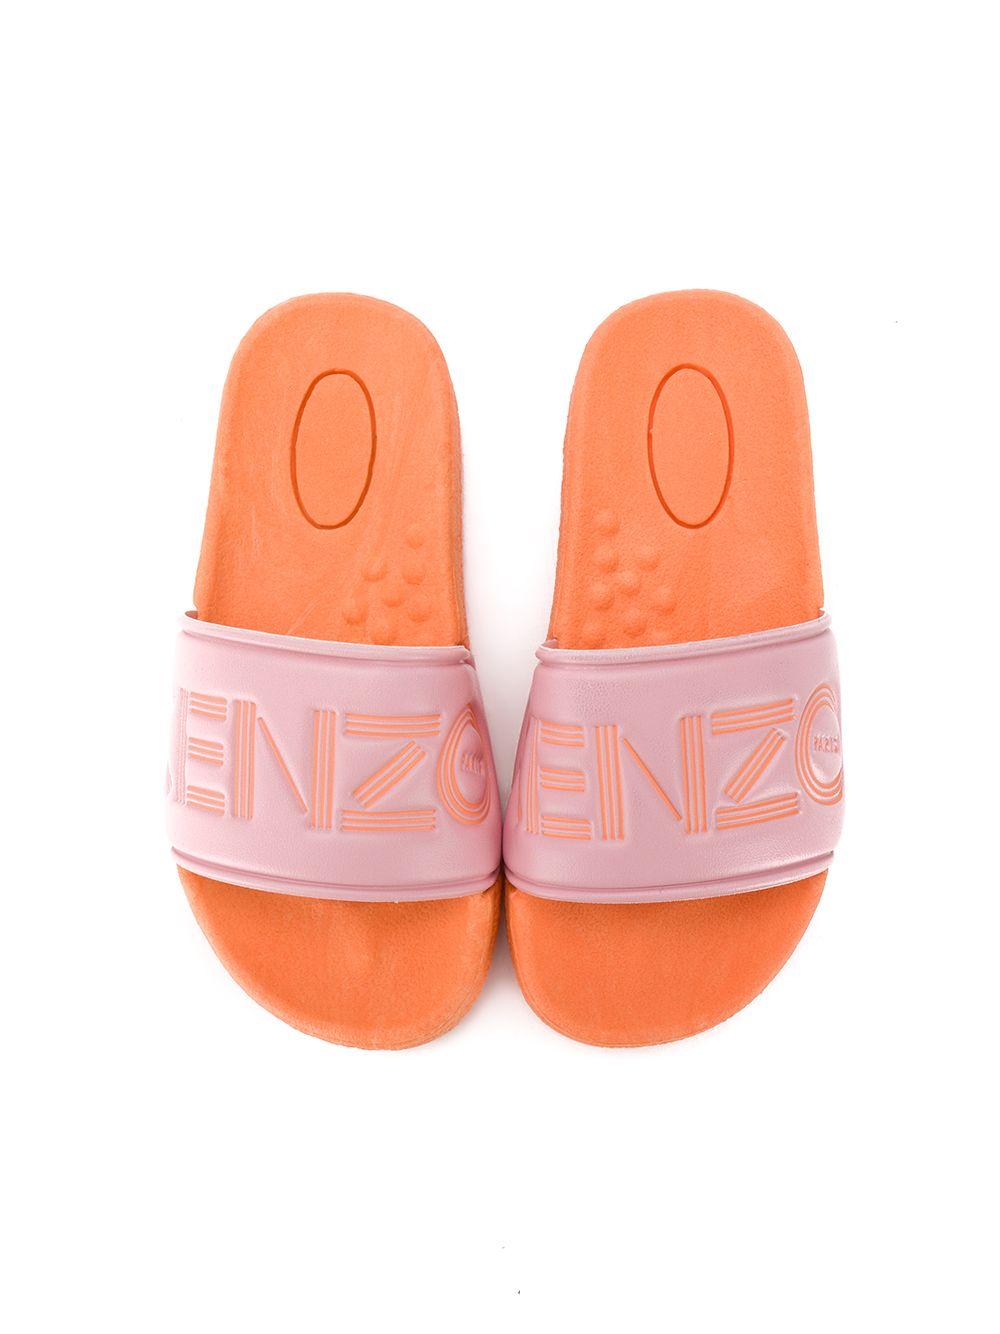 KENZO Kids | Kenzo Kids шлепанцы с тисненым логотипом | Clouty